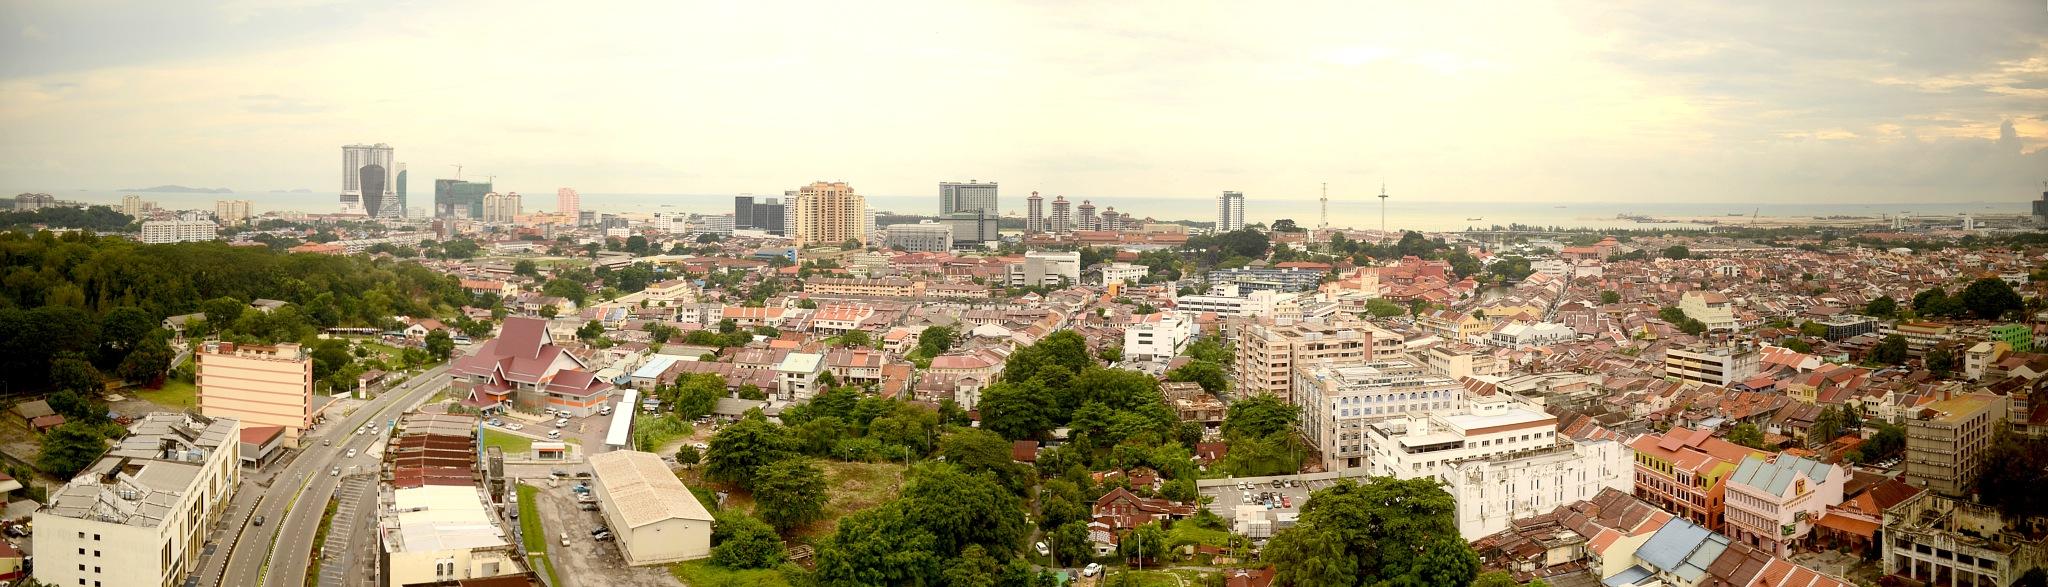 malacca city by wooyuenfoo